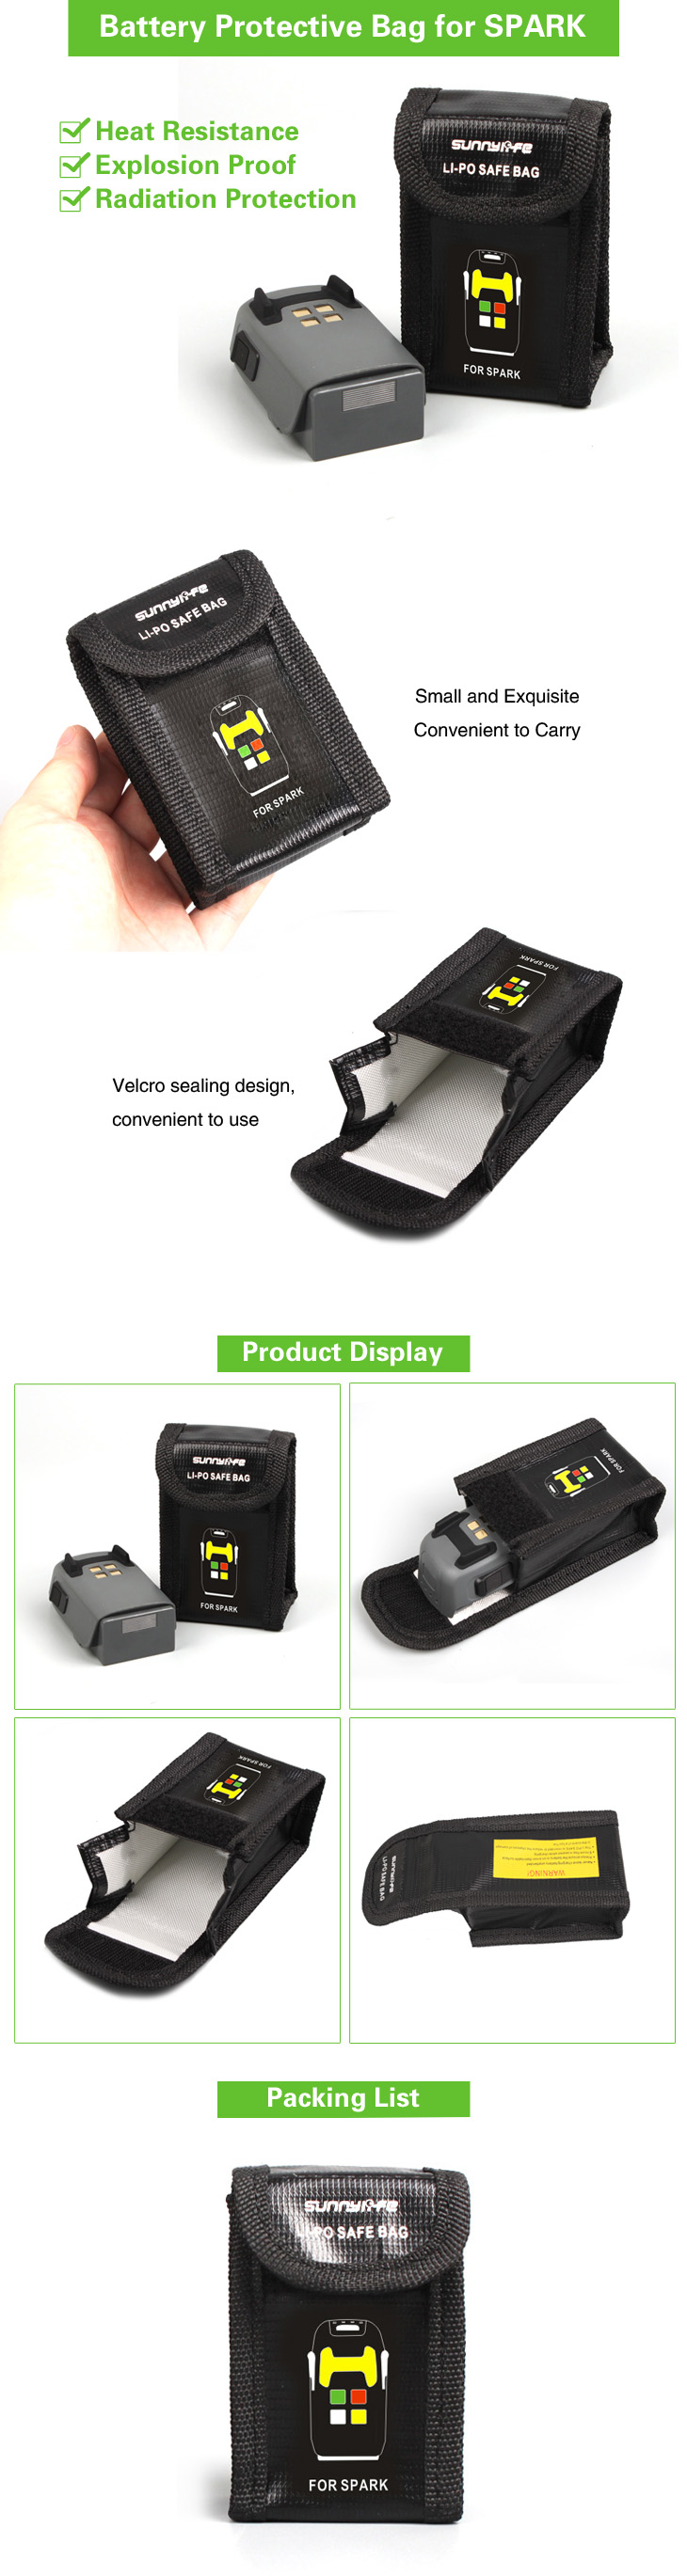 JMT Li-po Battery Safe Bag Heat Resistence Fireproof Radiation Protective Bag Large/Small for DJI Spark Drone F21241/42